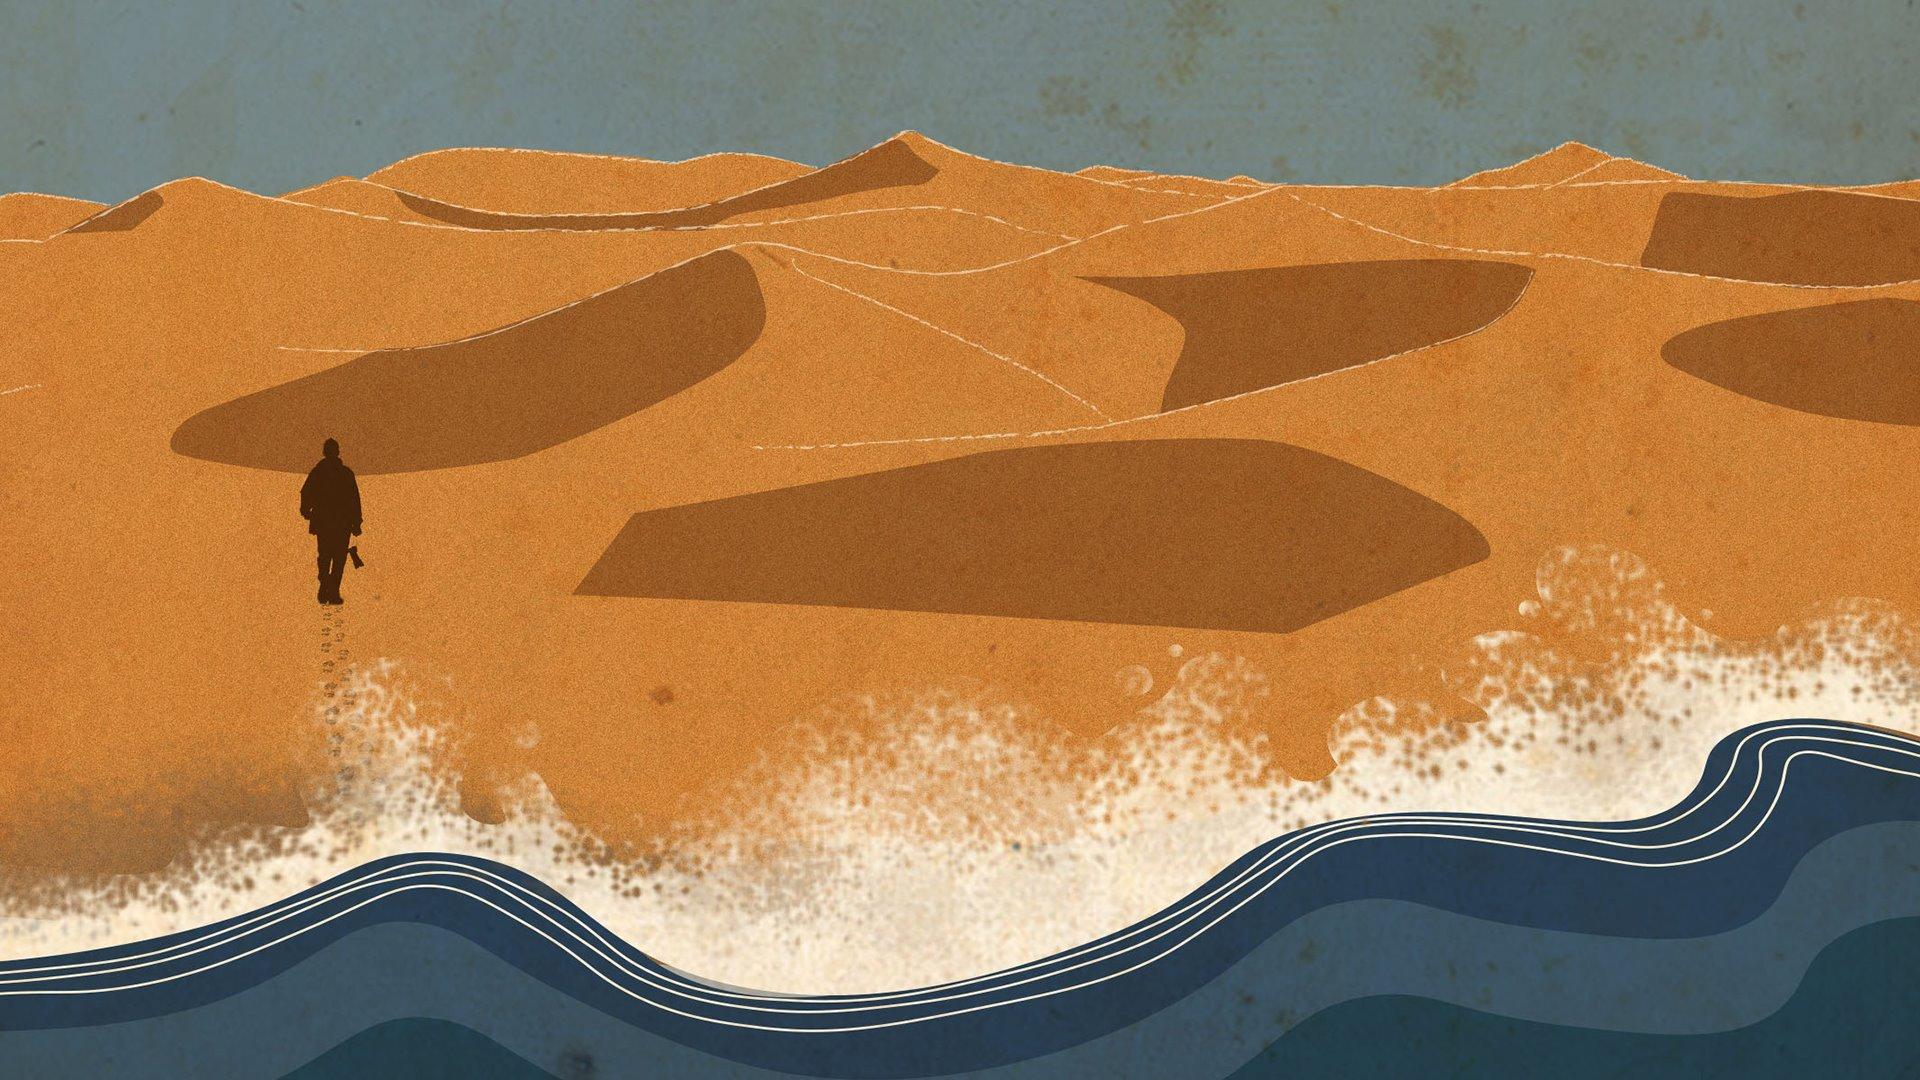 The Human Condition: Ocean or Desert?